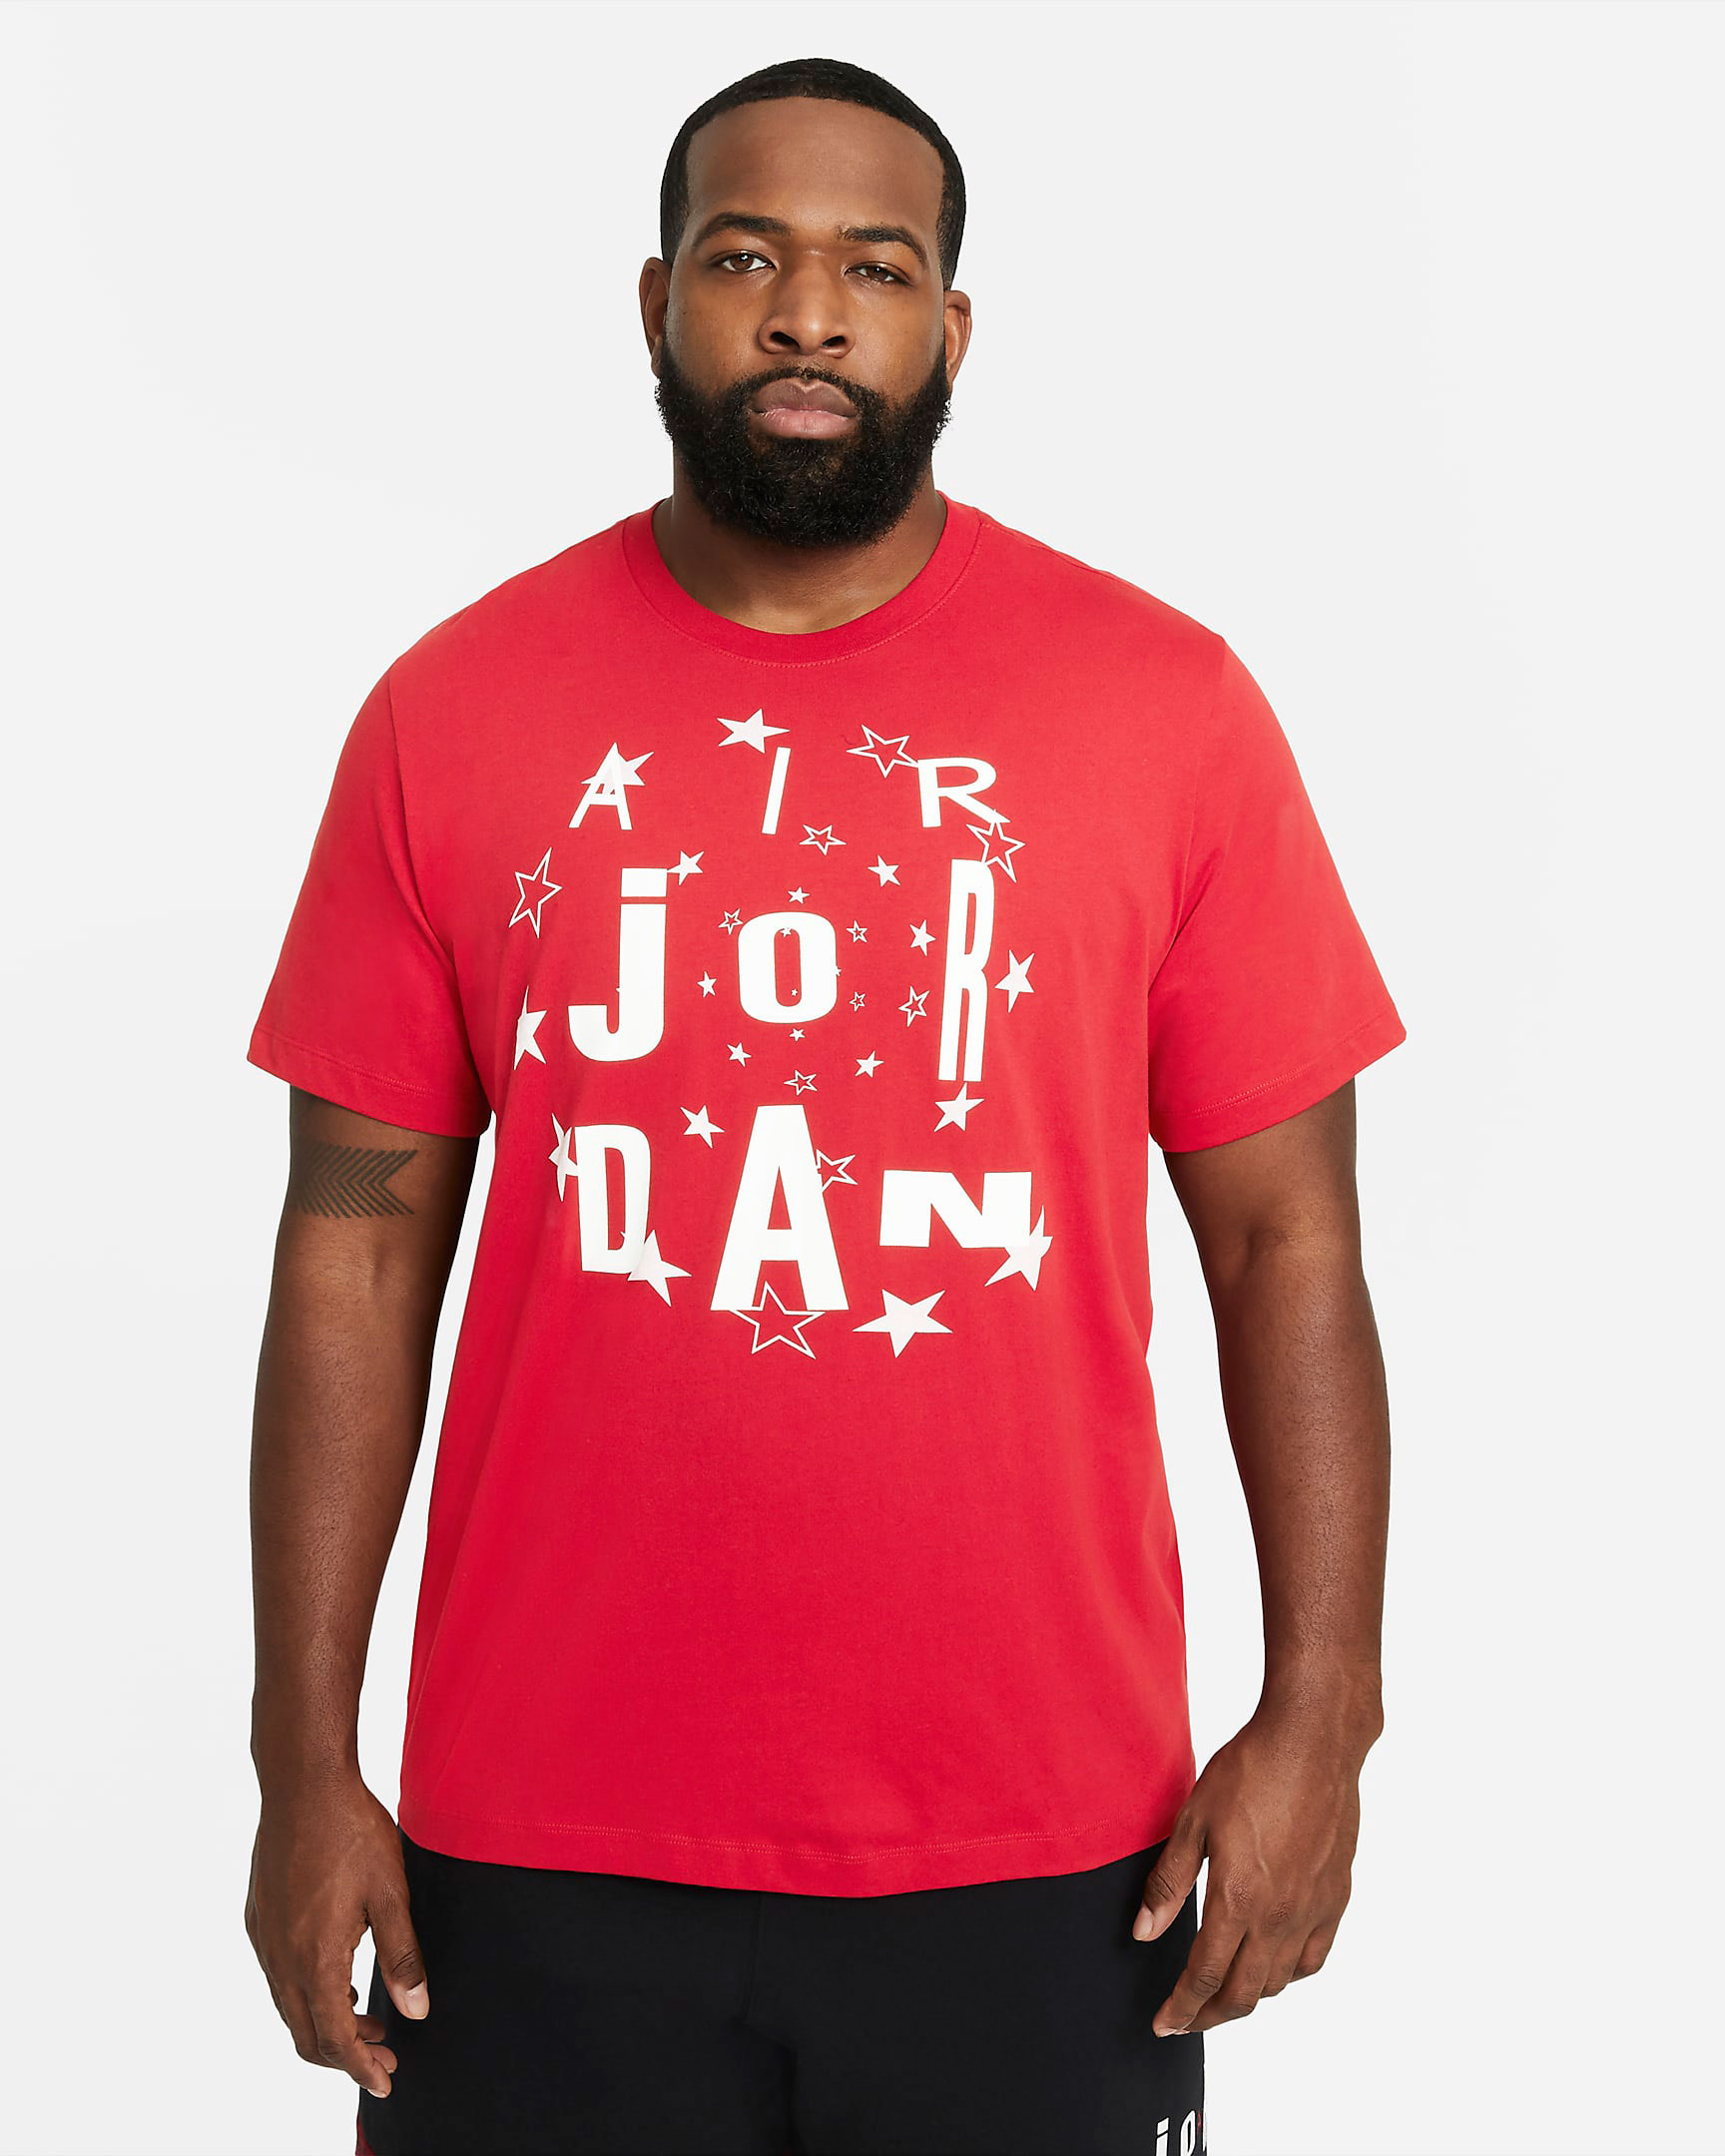 carmine-air-jordan-6-2021-t-shirt-1